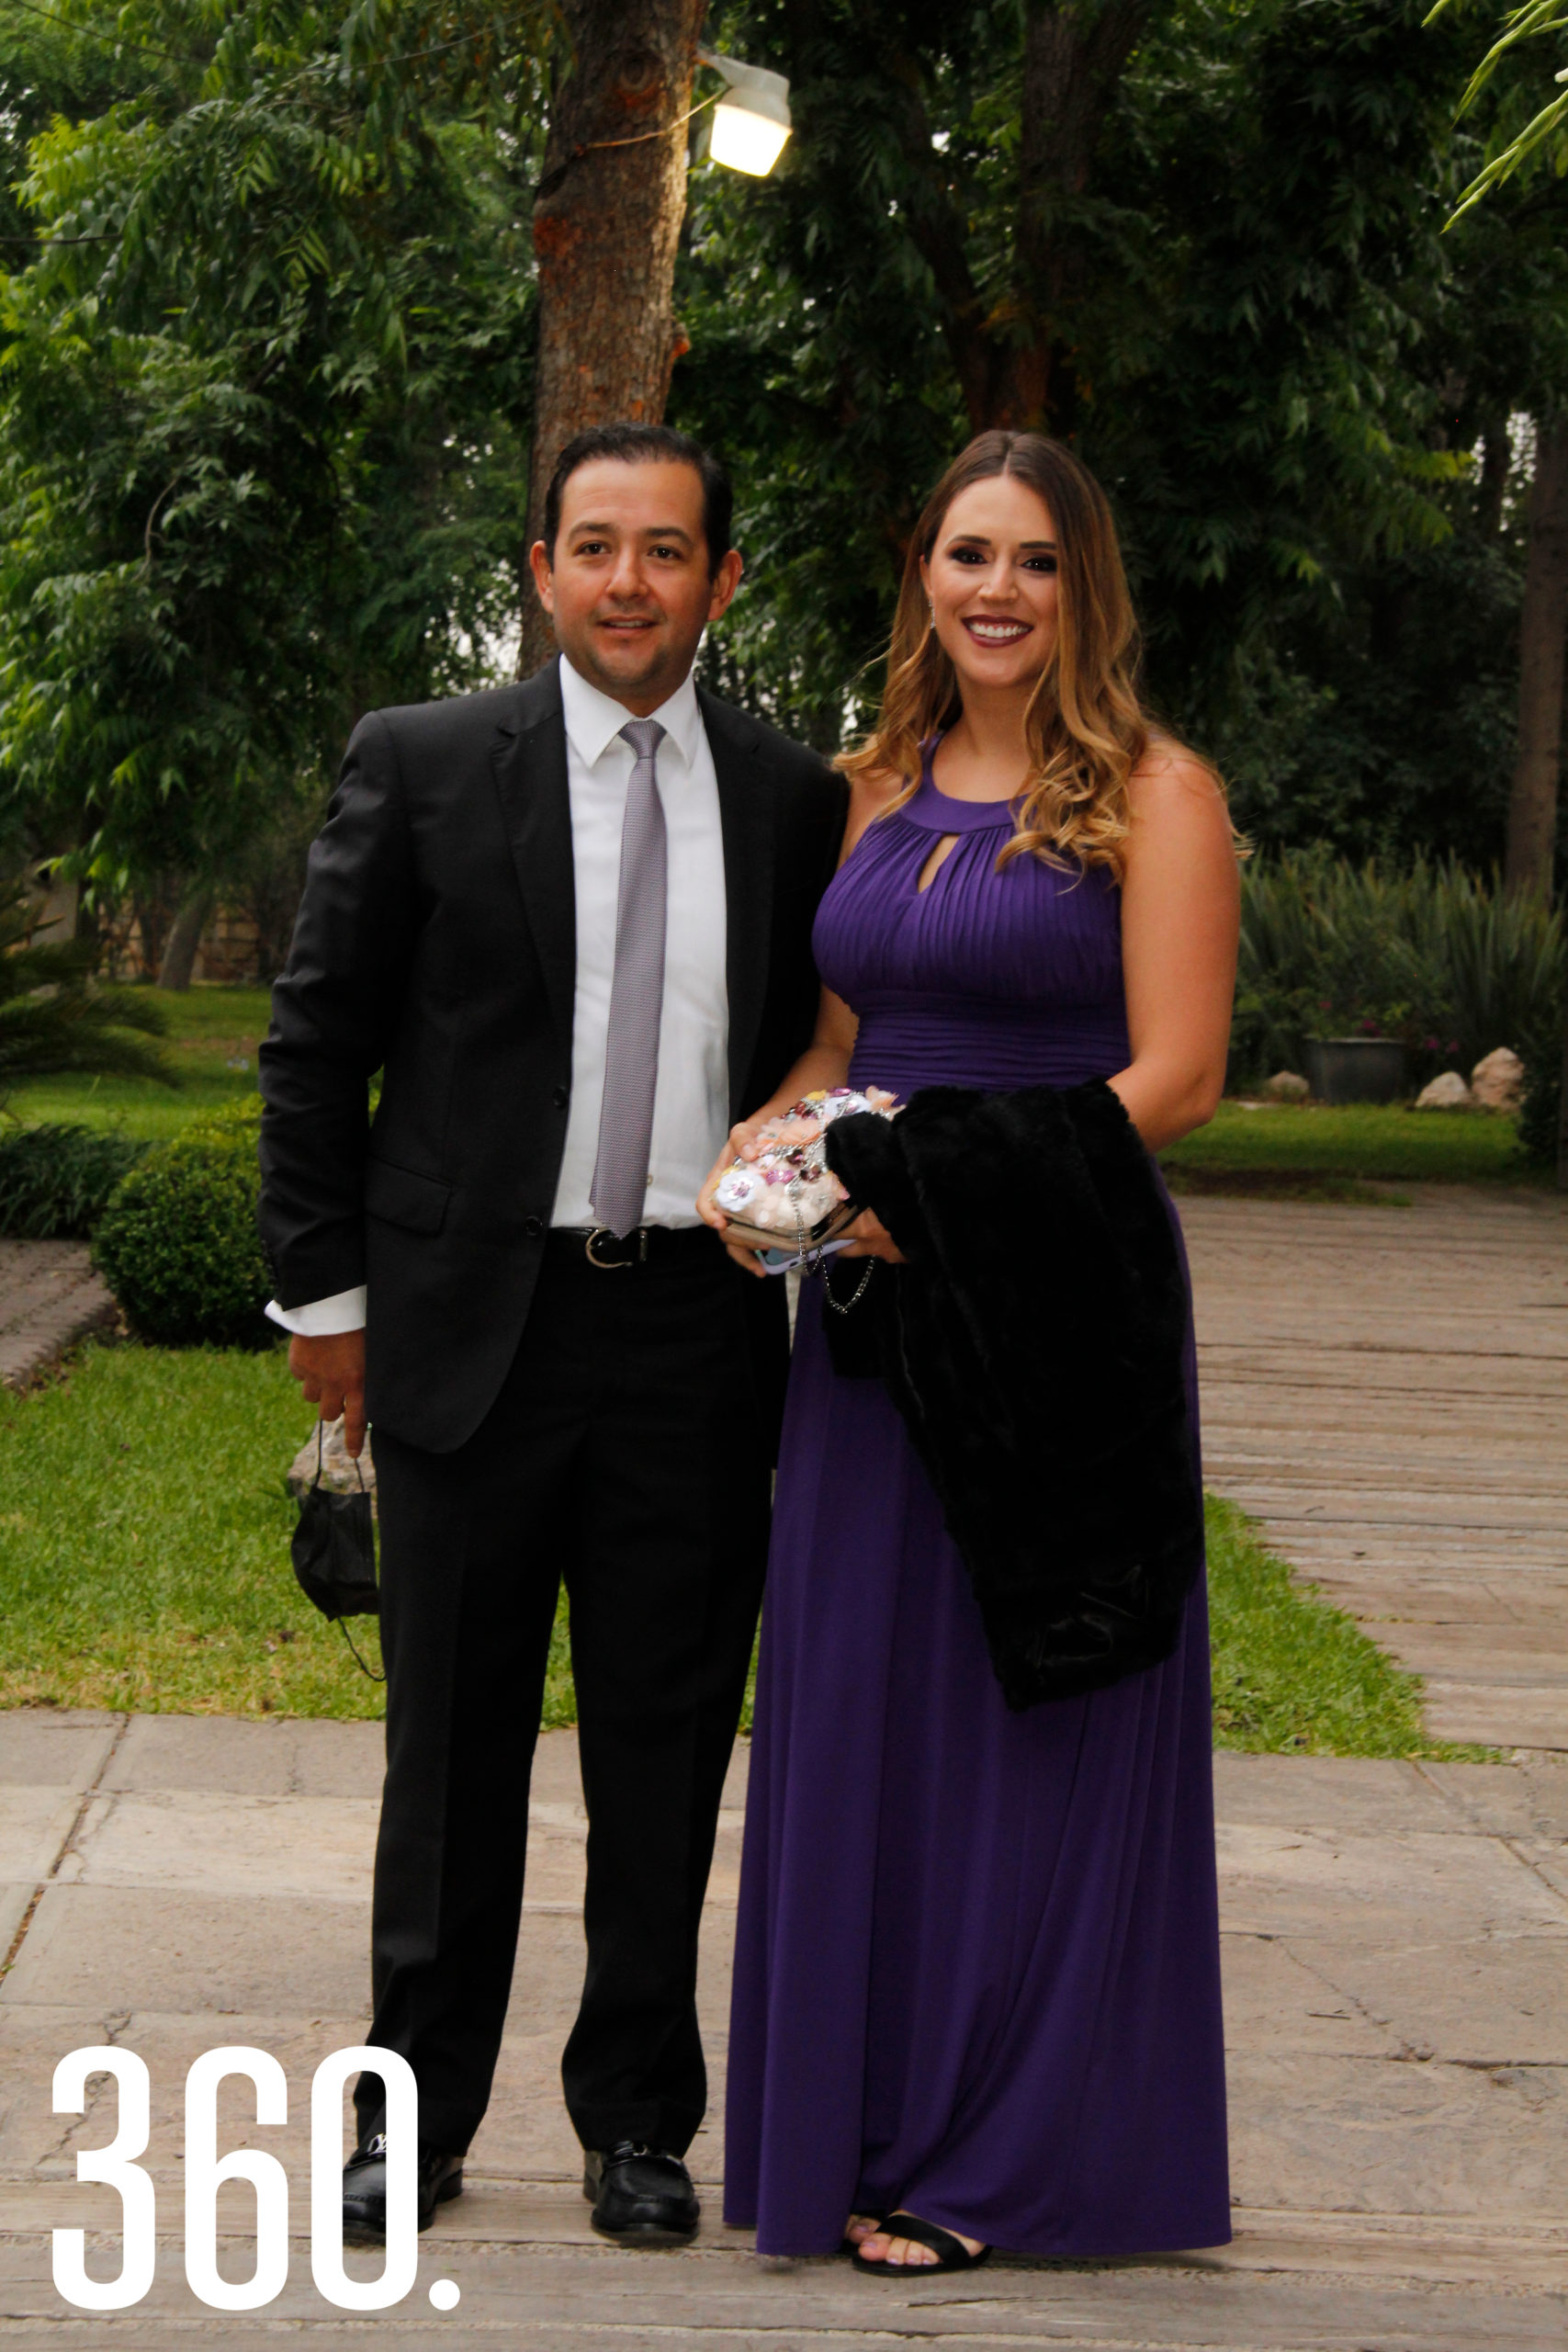 José Luis Pérez y Cristina Dávila.